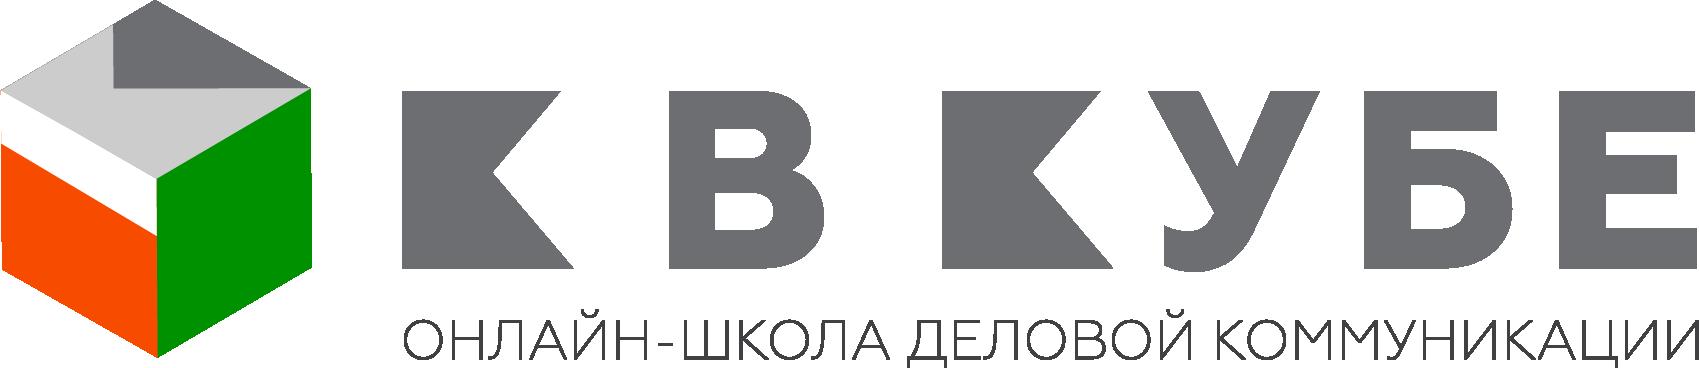 k3_logo_dark (1)